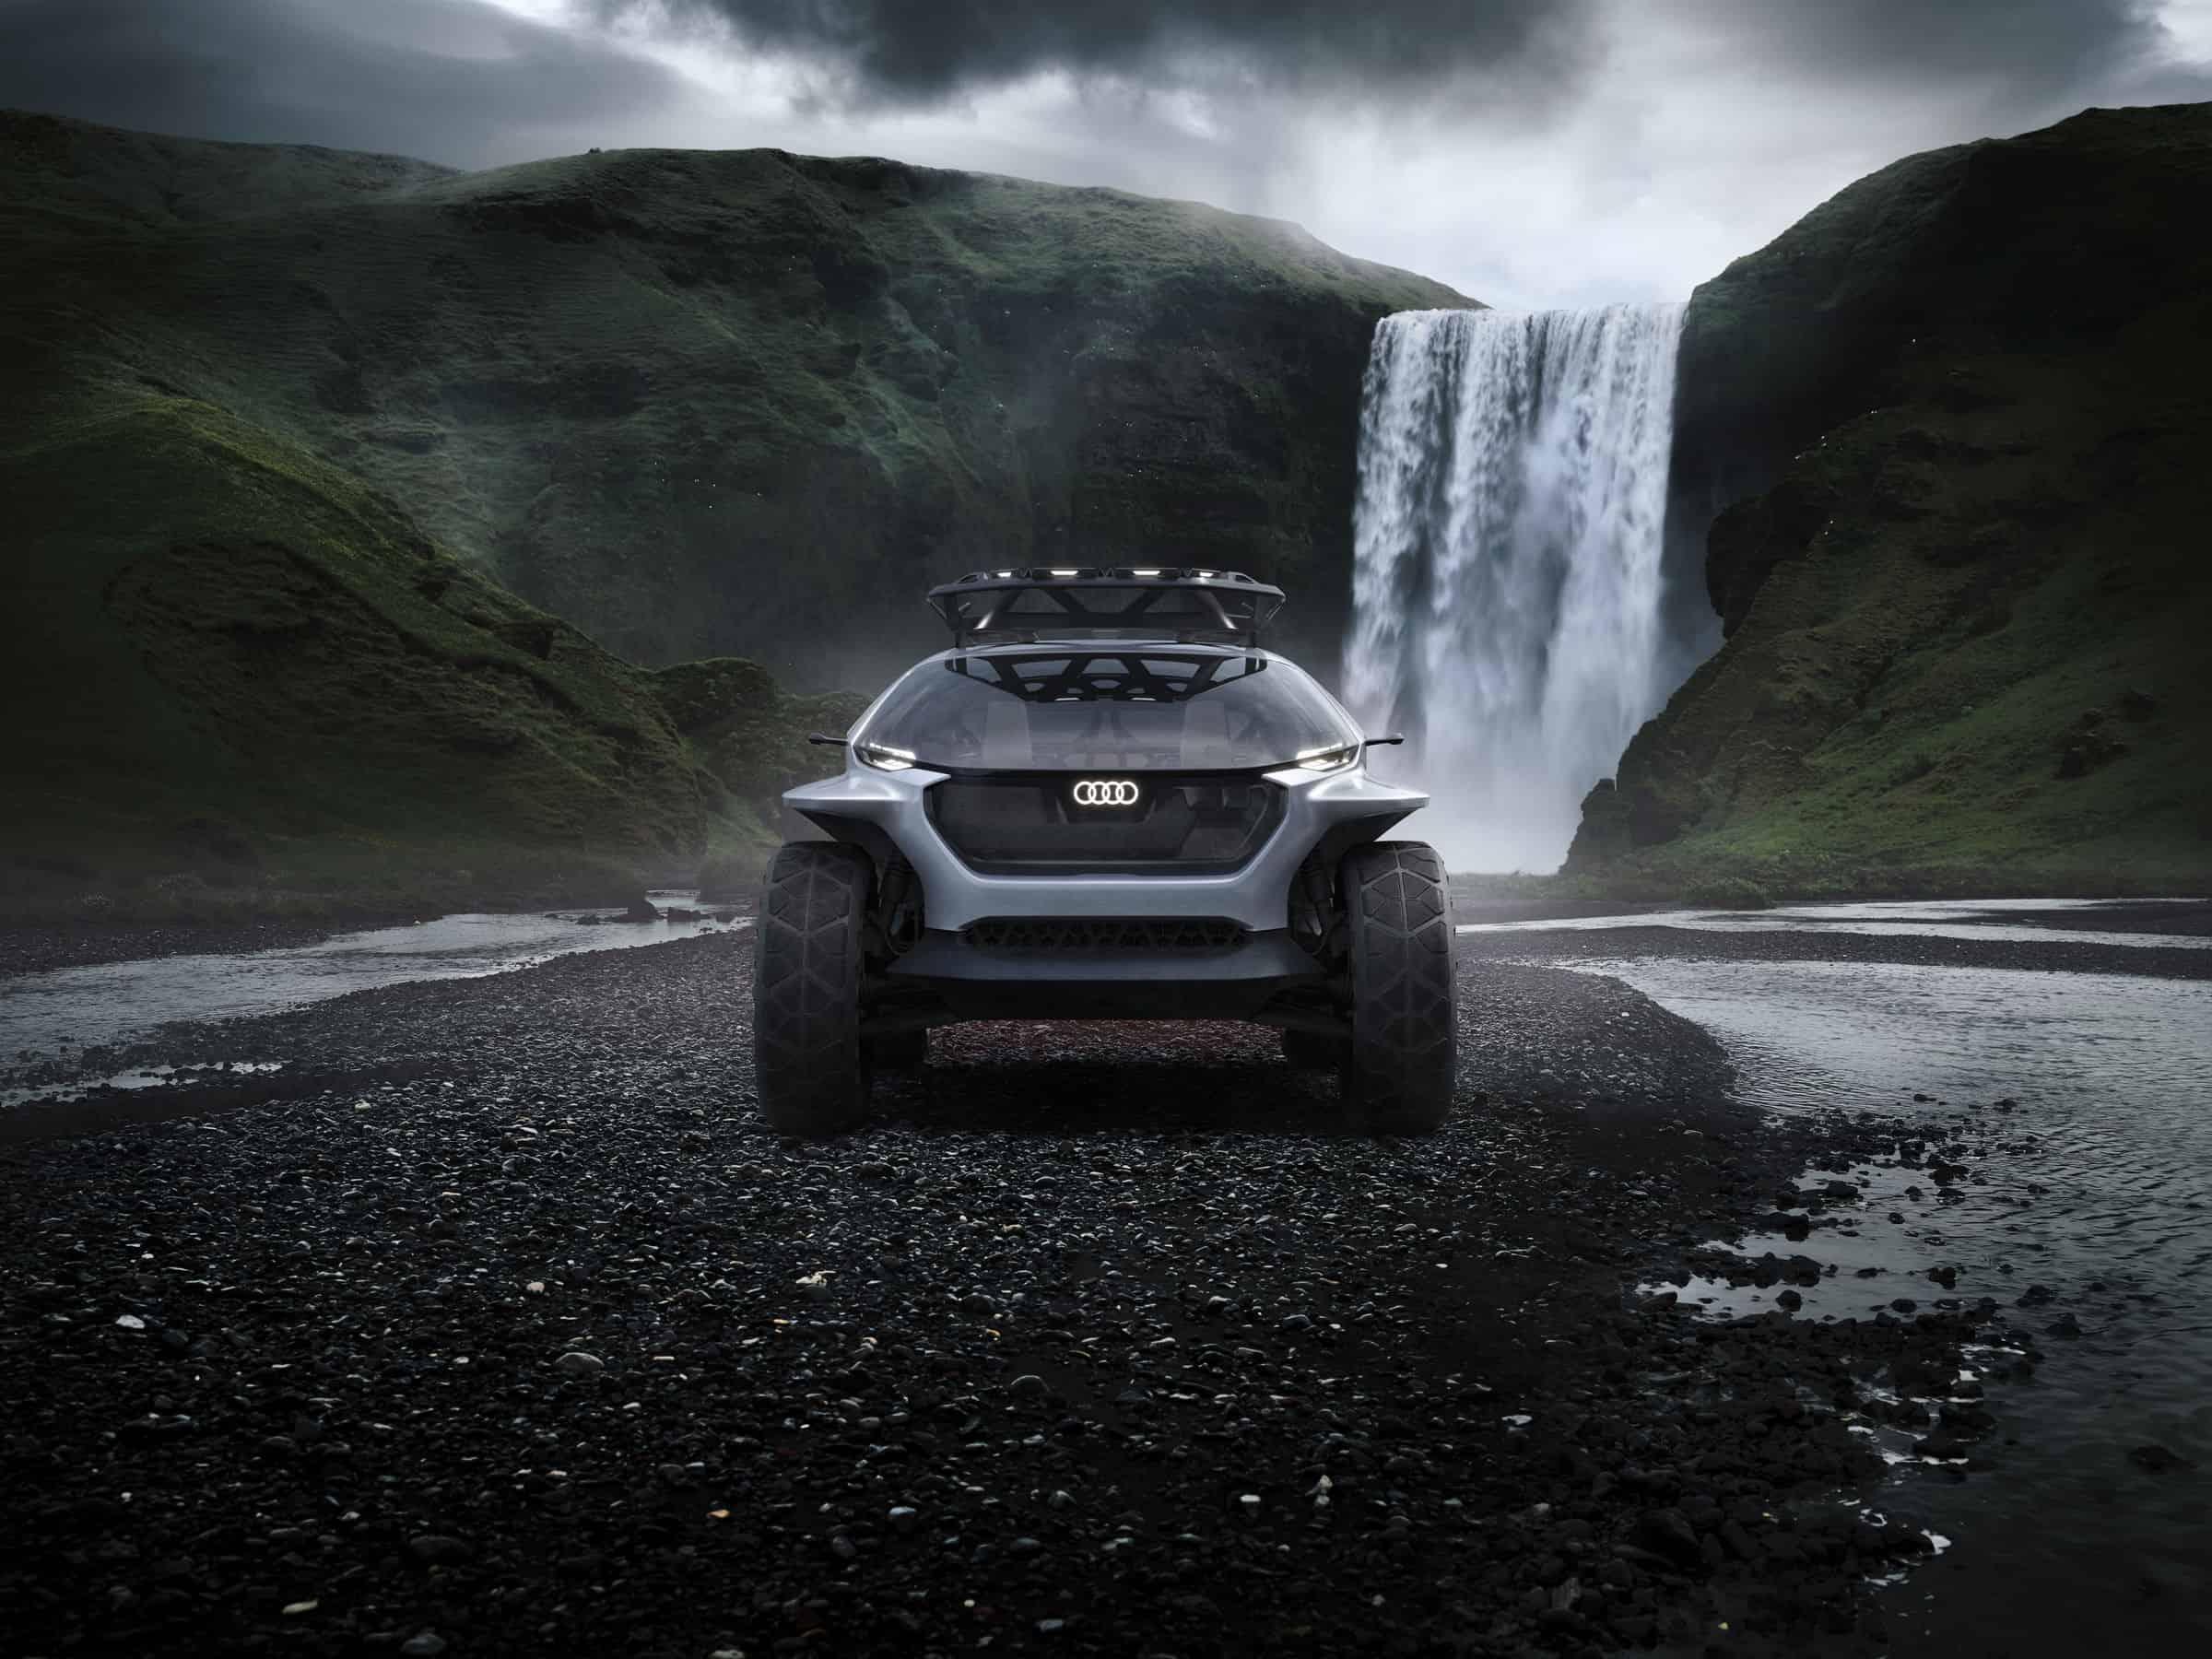 audi ai trail off-road concept vehicle